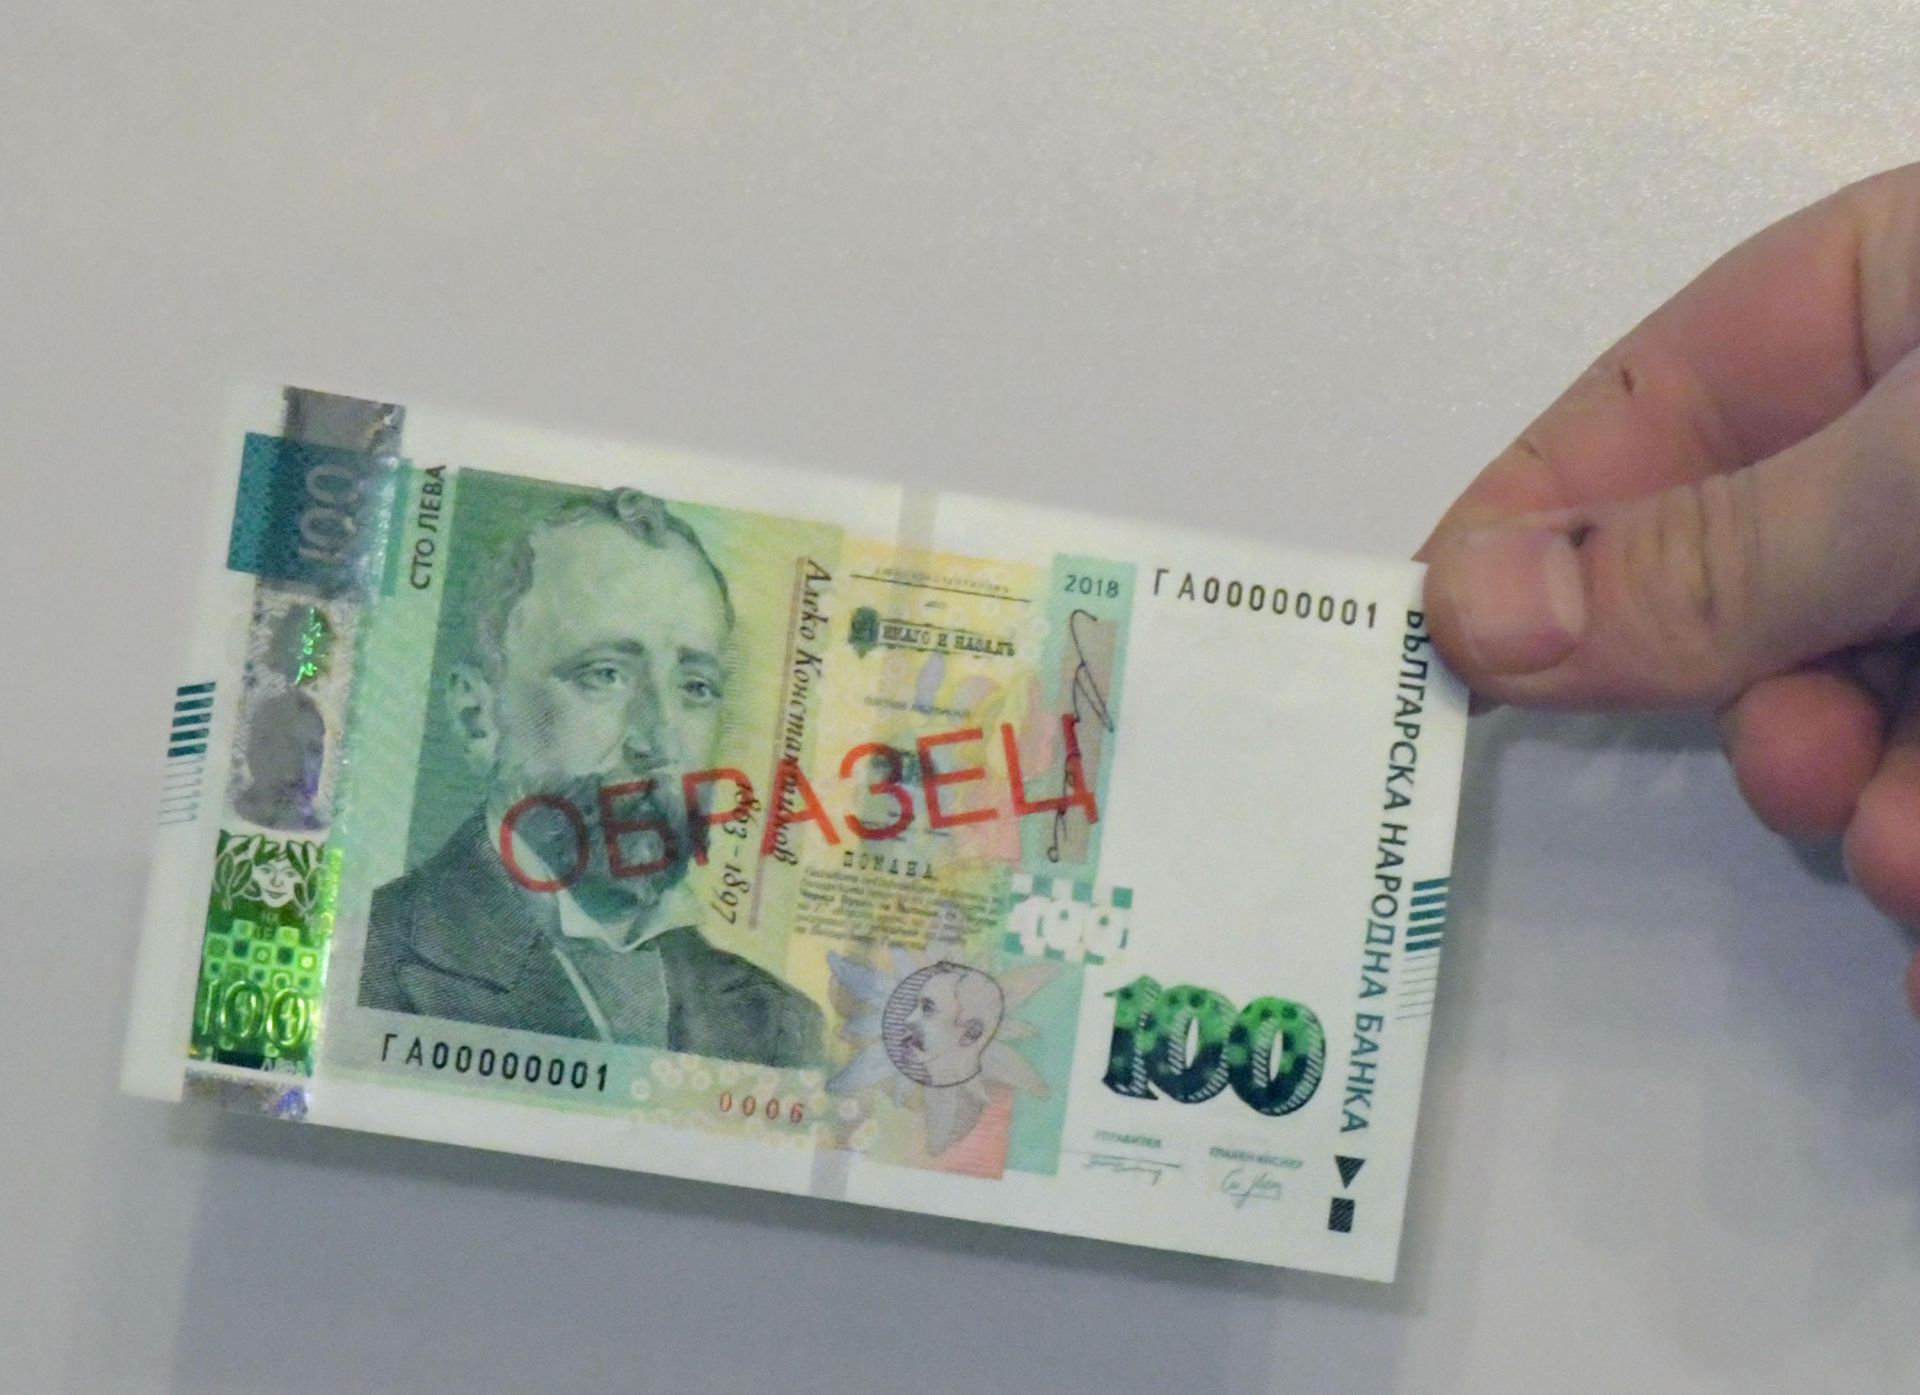 Банкнотата има нови защити знаци